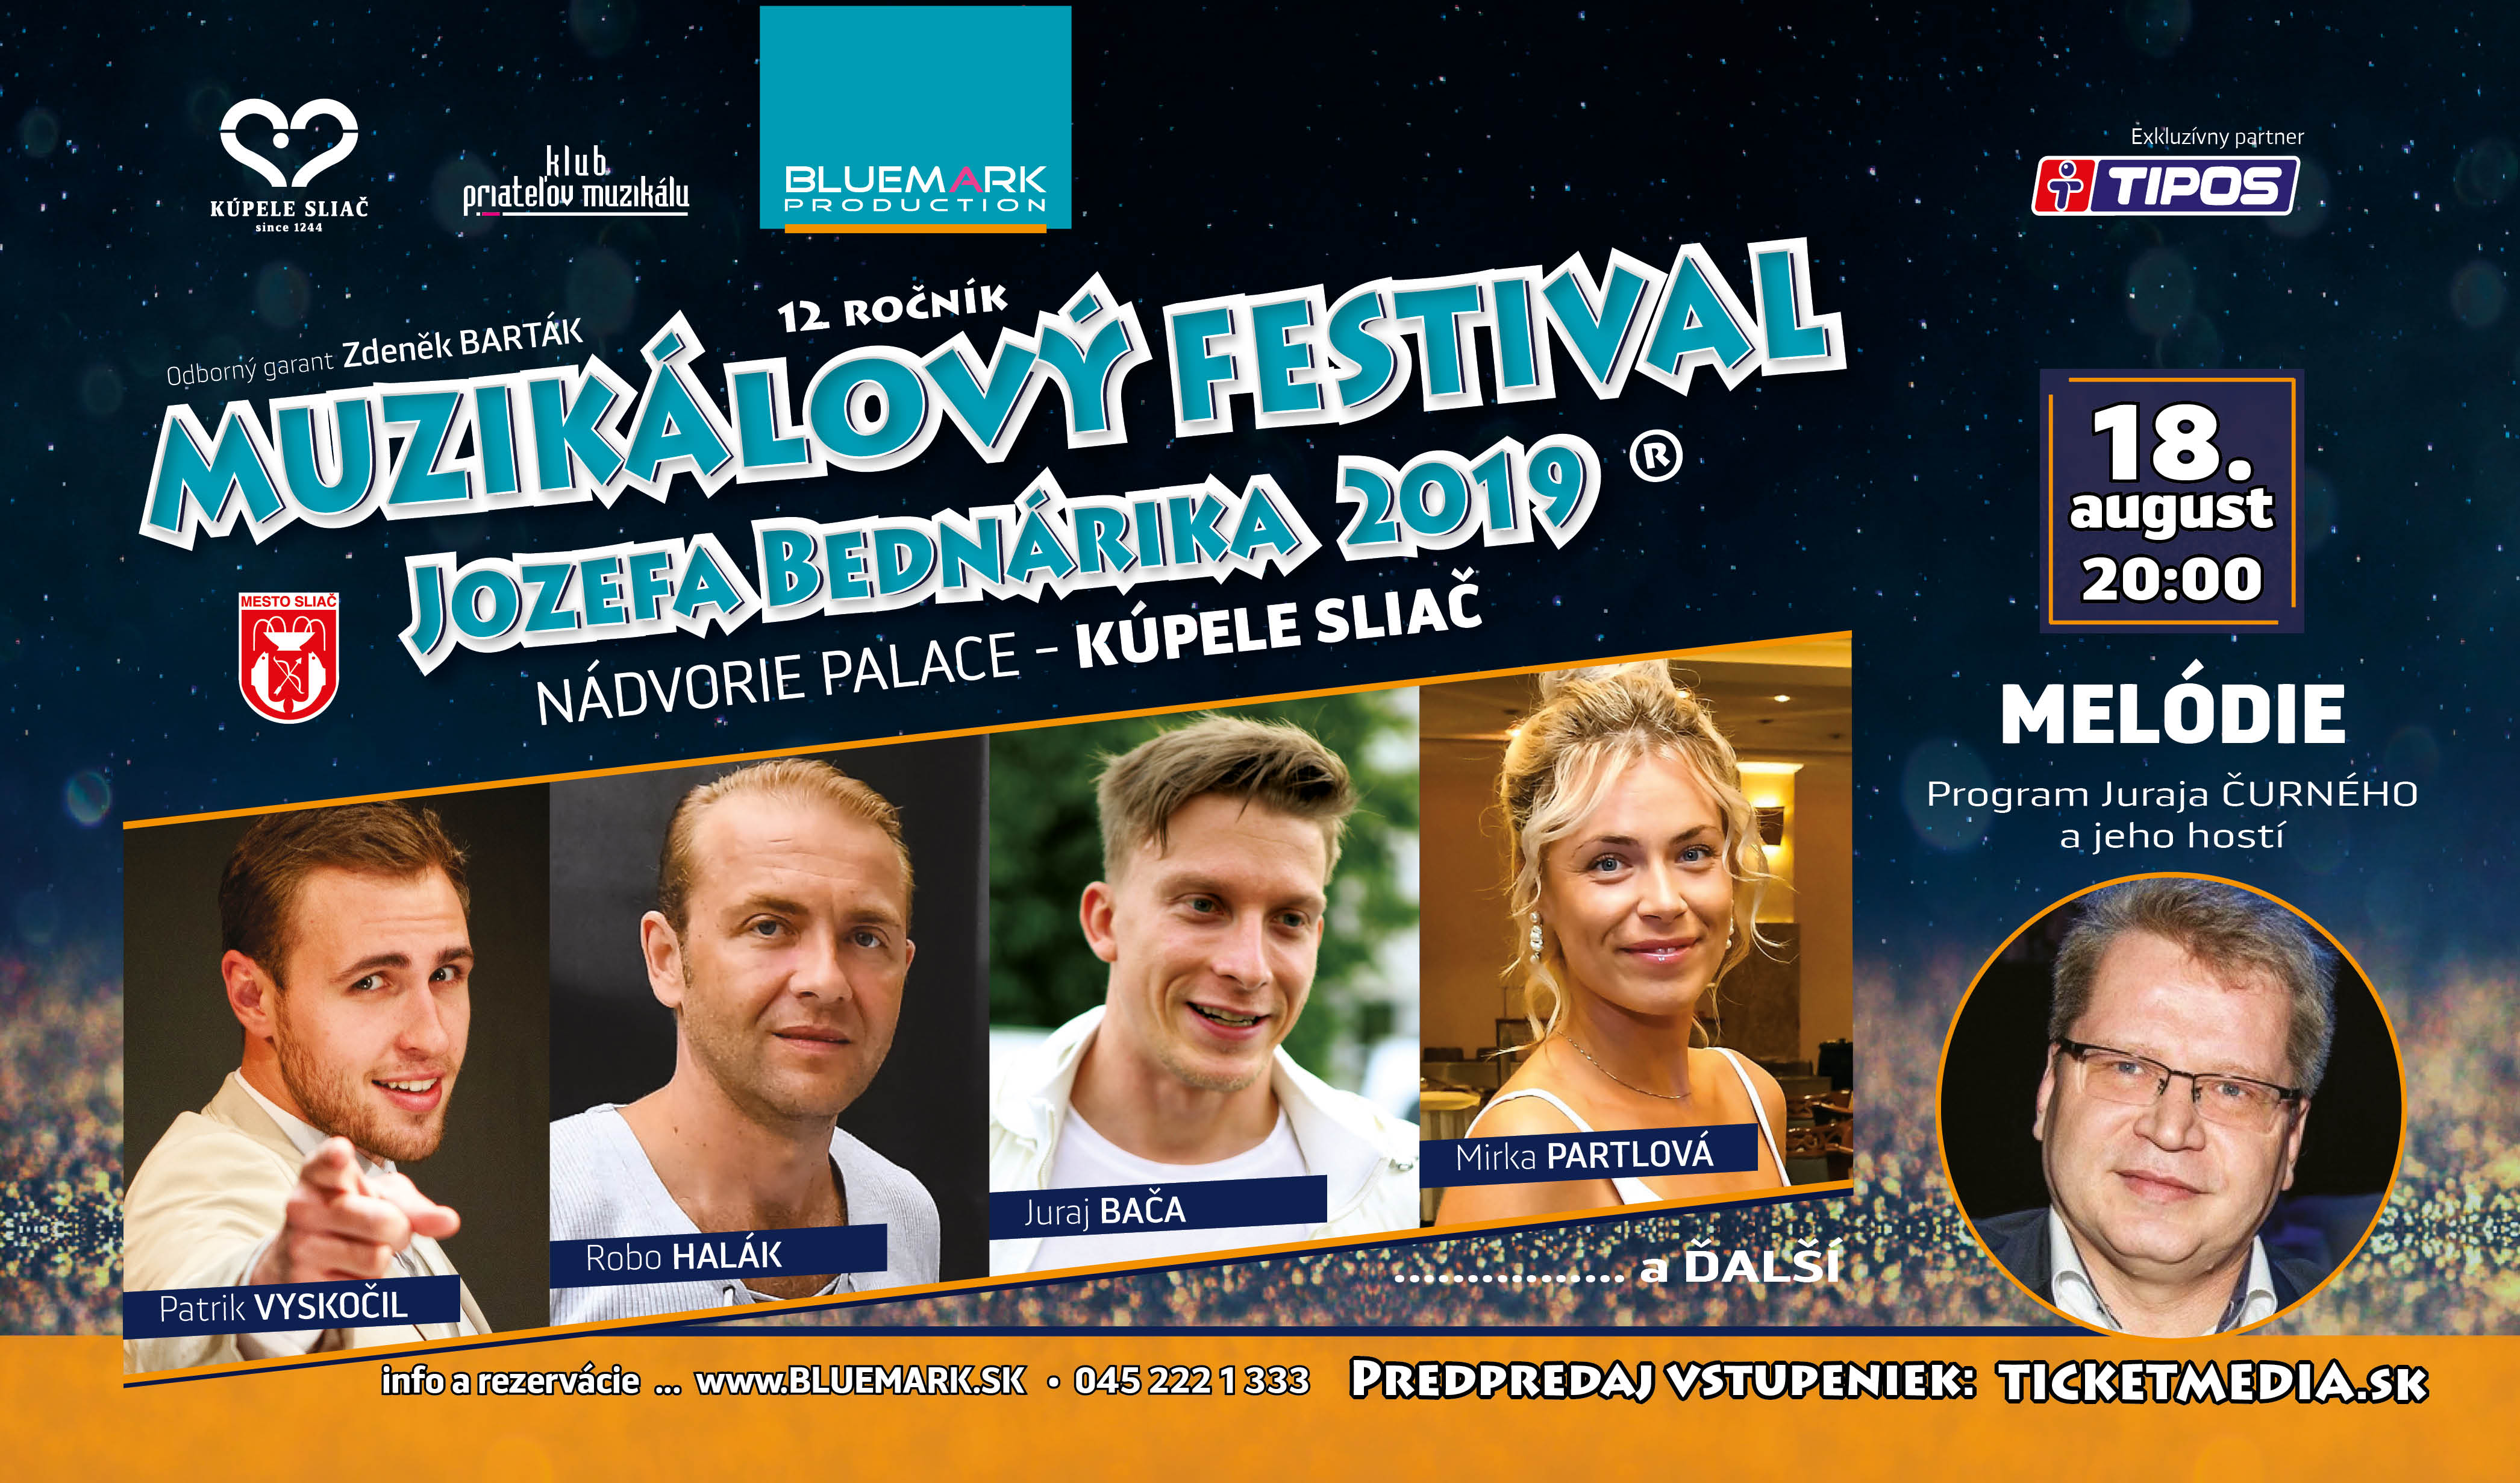 muzikalovy-festival-bednarika-plagat-sliac-10